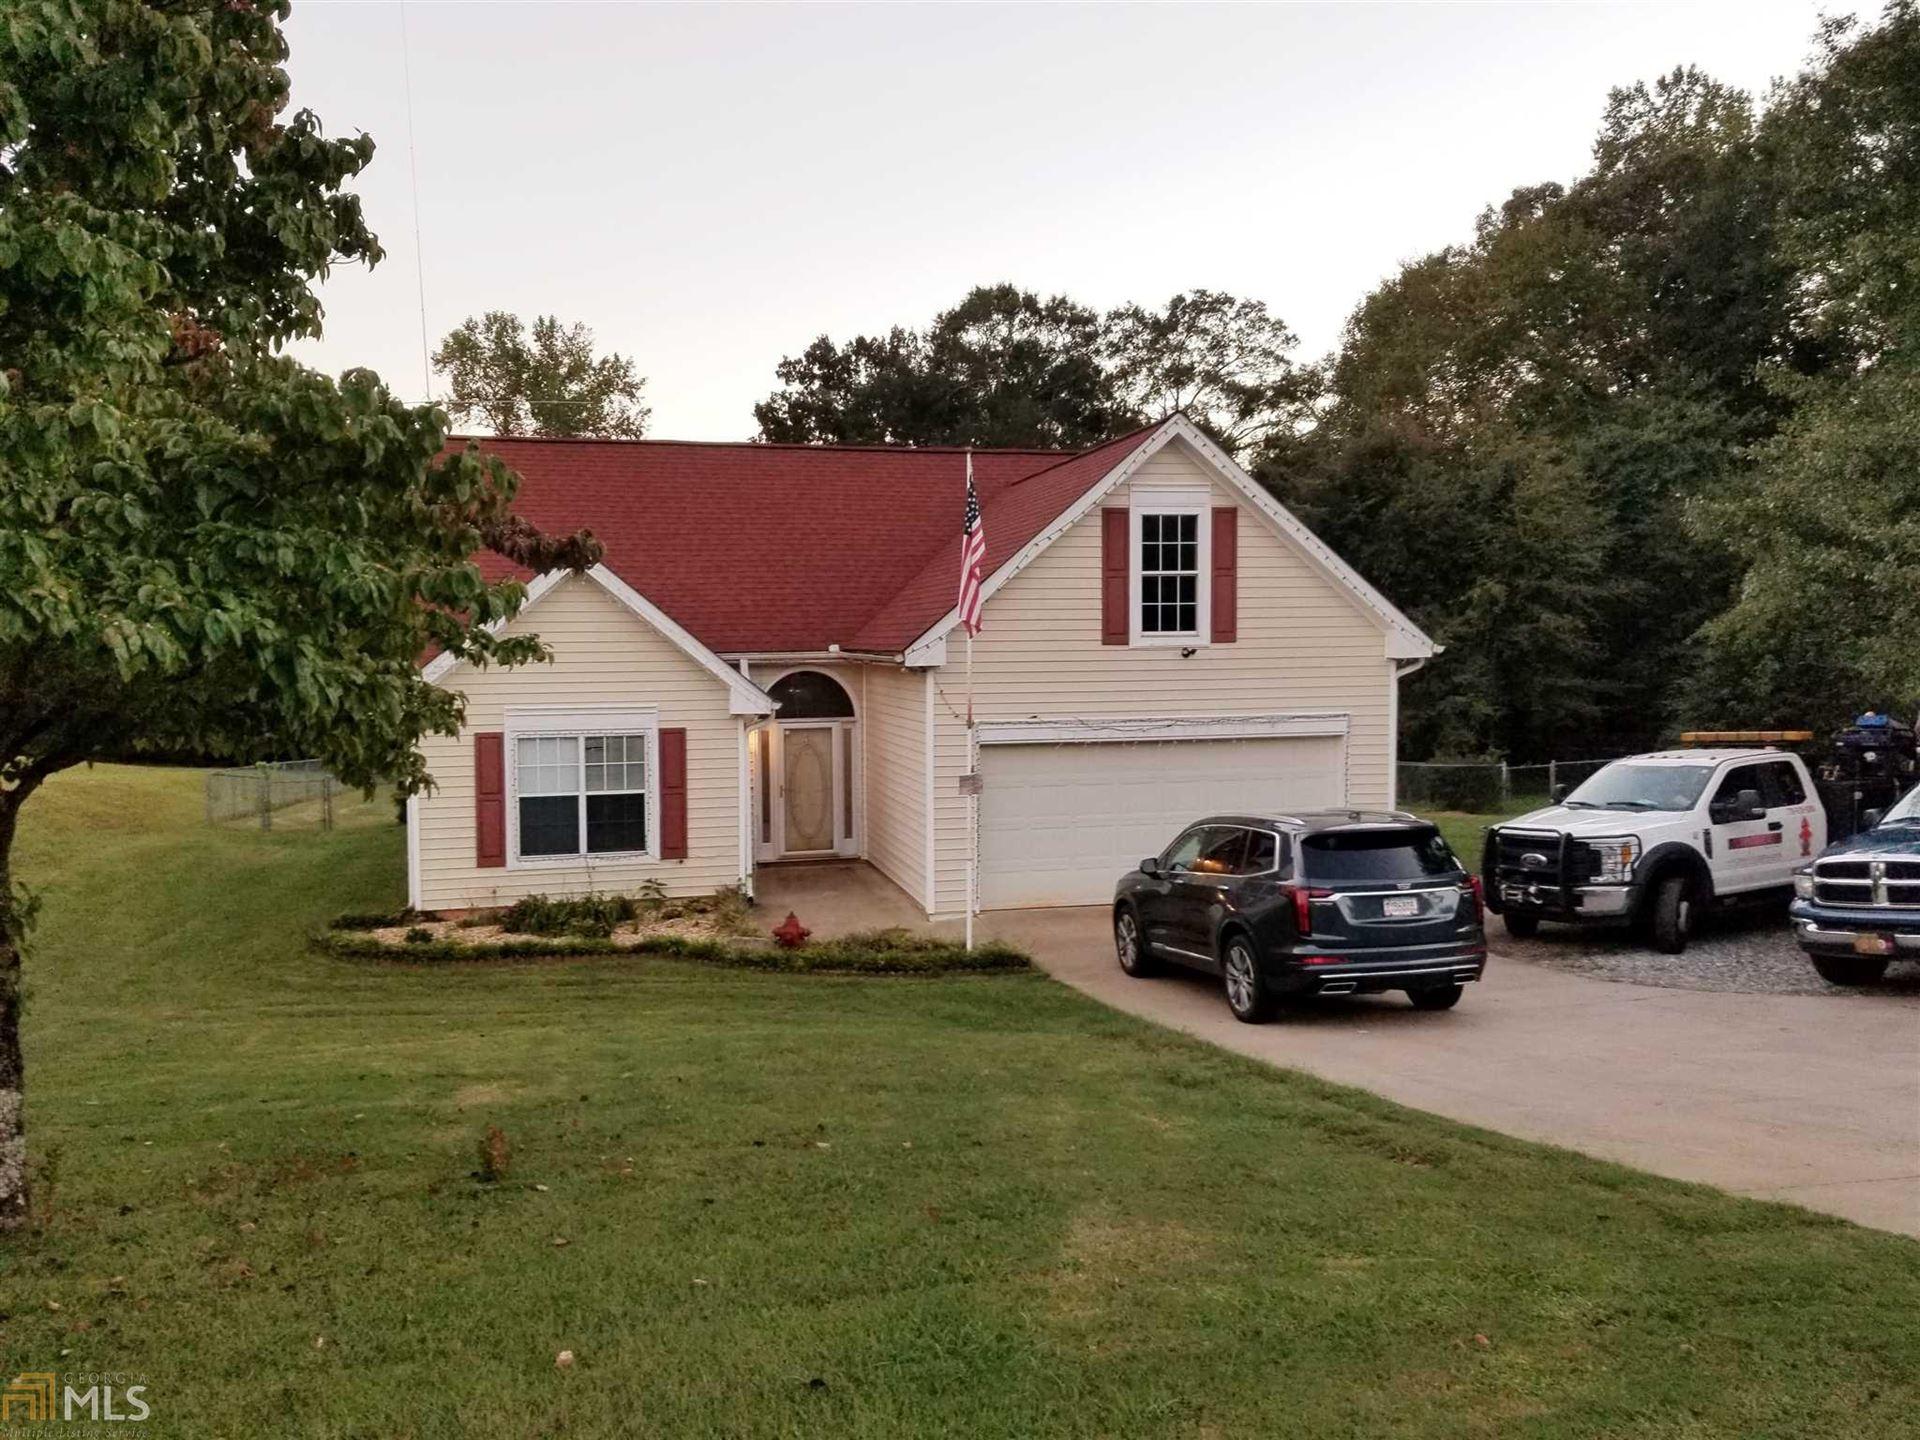 161 Mills Dr, Covington, GA 30016 - #: 8912574